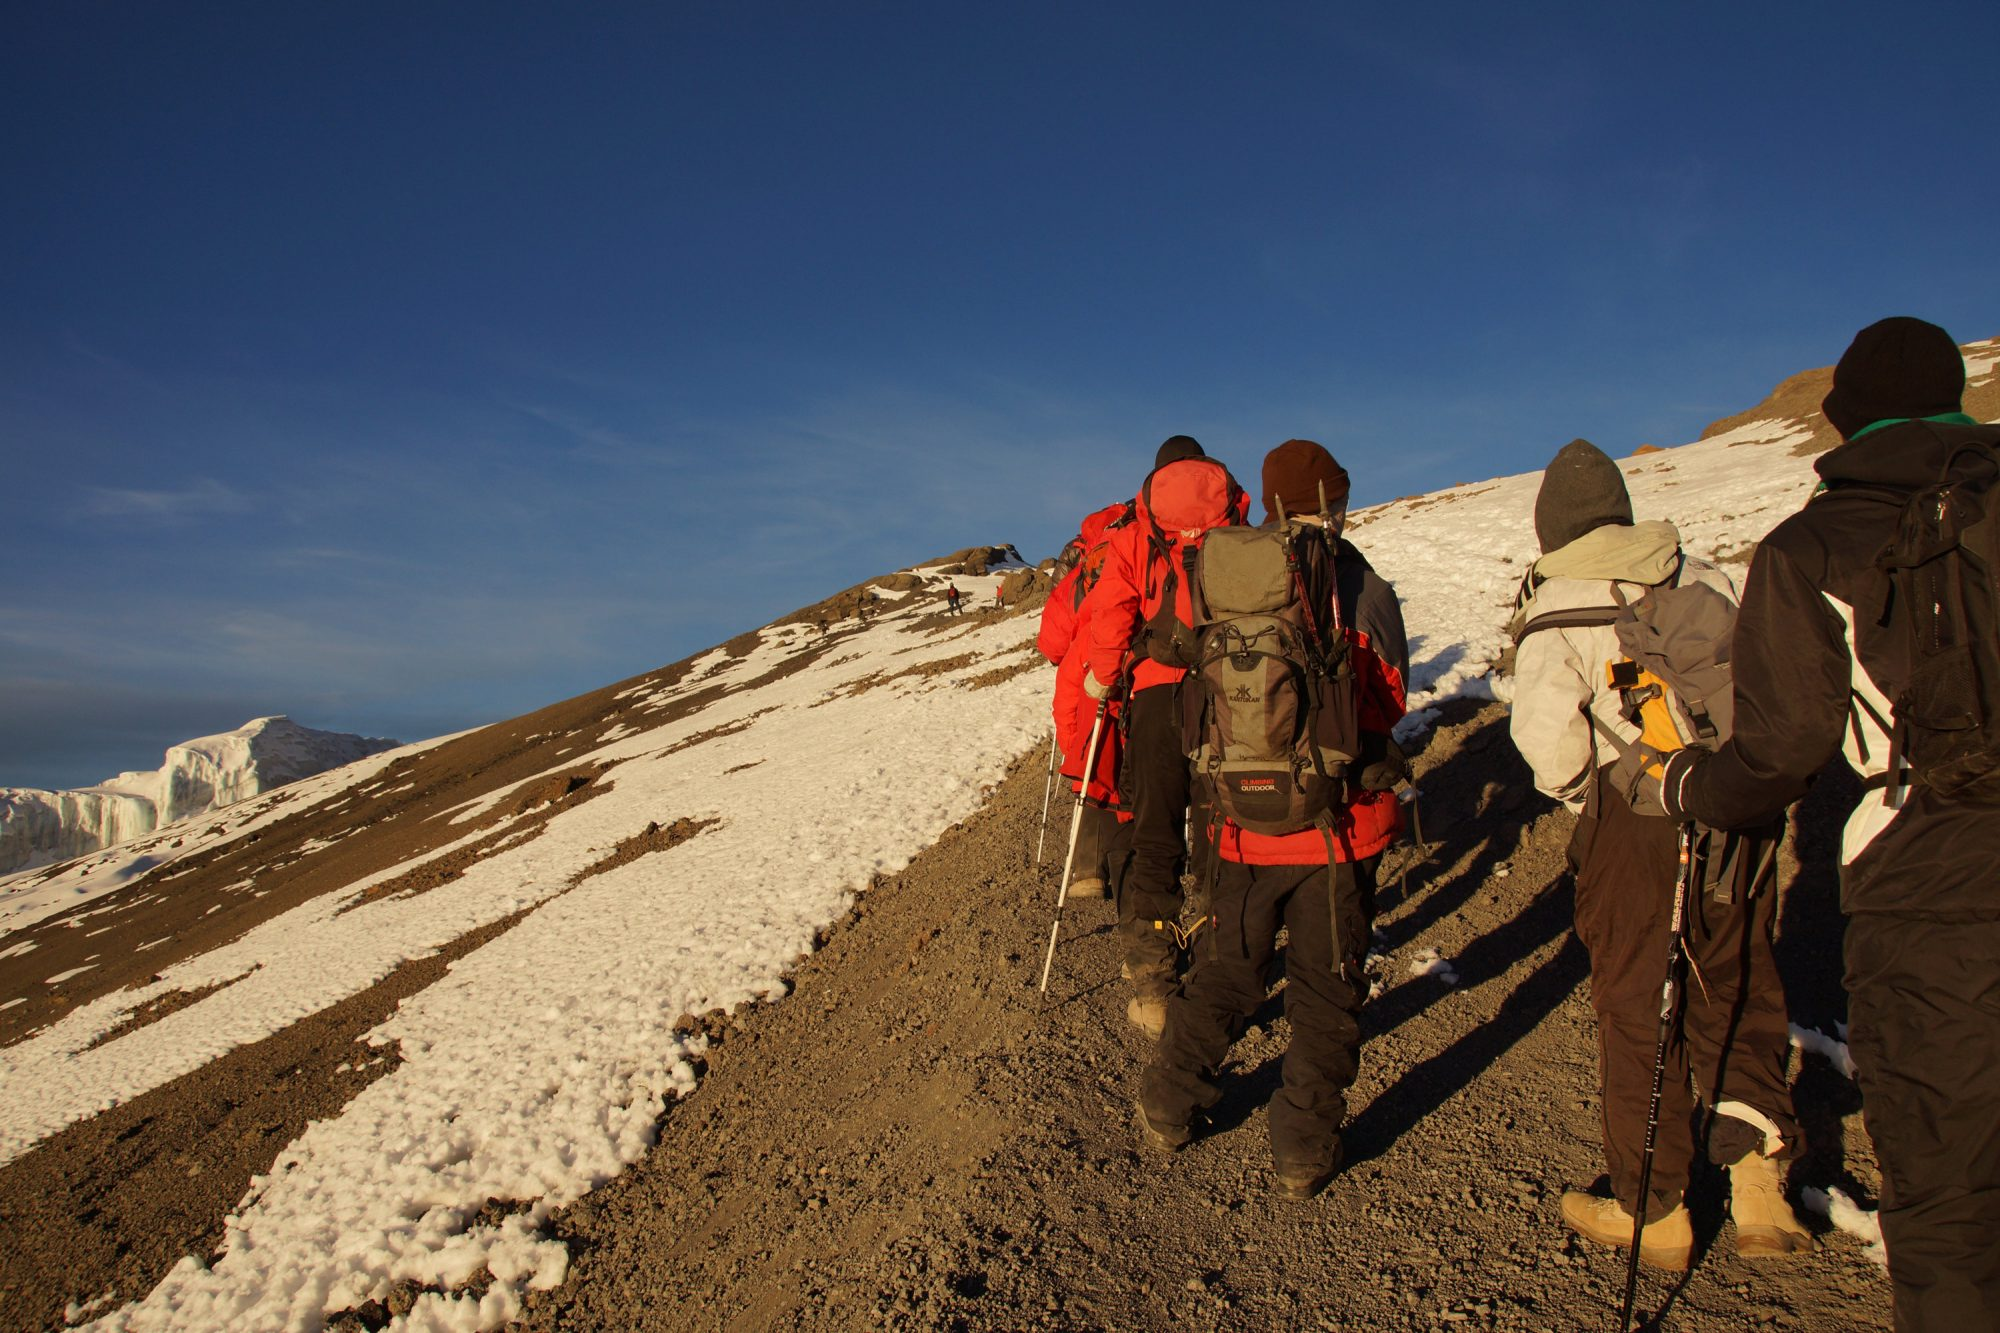 Weg zum Gipfel, Kilimandscharo, Kilimandscharo besteigen, Tansania, Afrika, Kilimandscharo Tour, Erfahrungsbericht, Machame Route